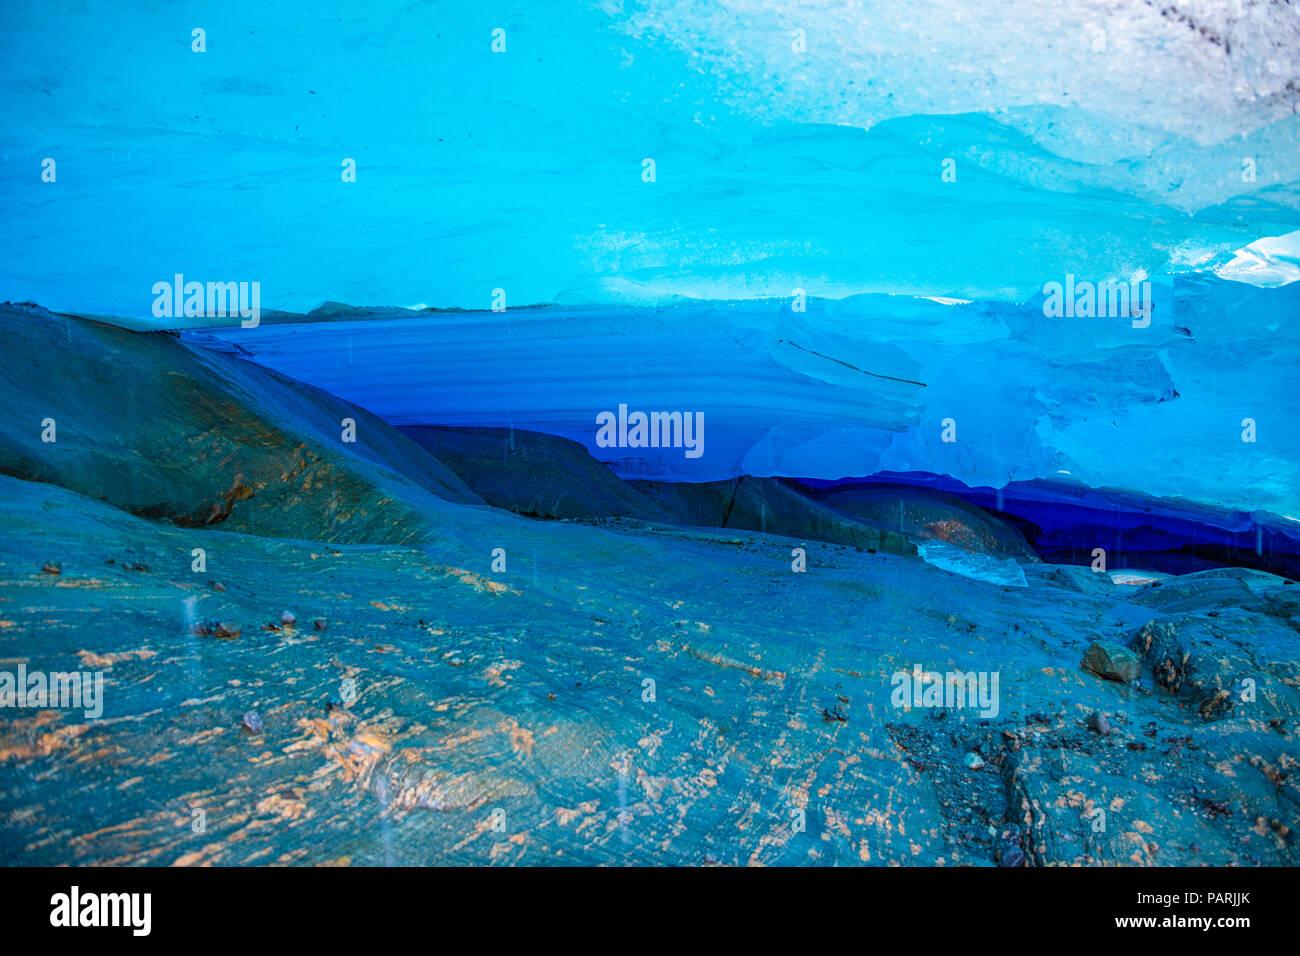 Grotte de glace bleu glacier Svartisen, Norvège Photo Stock